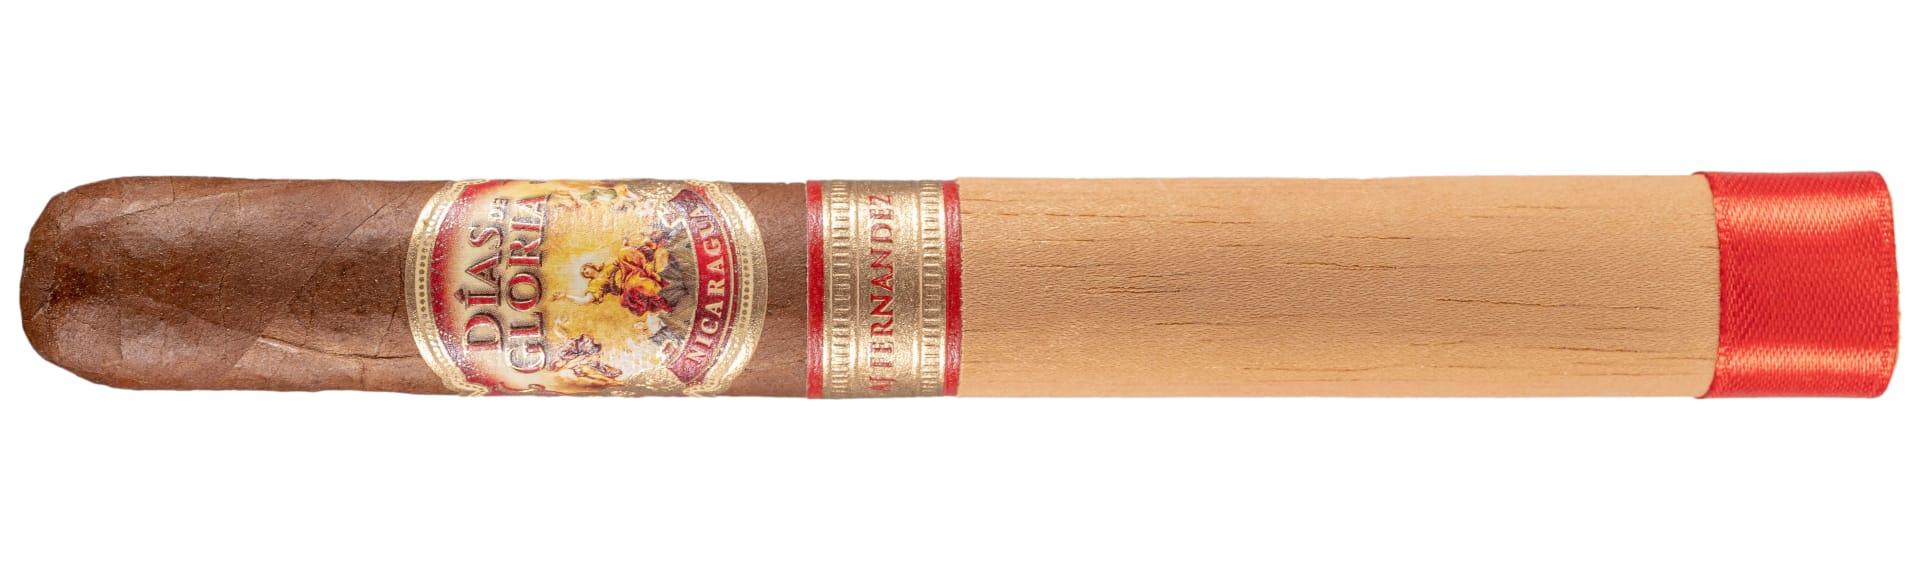 Blind Cigar Review: AJ Fernandez | Días De Gloria Short Churchill Featured Image